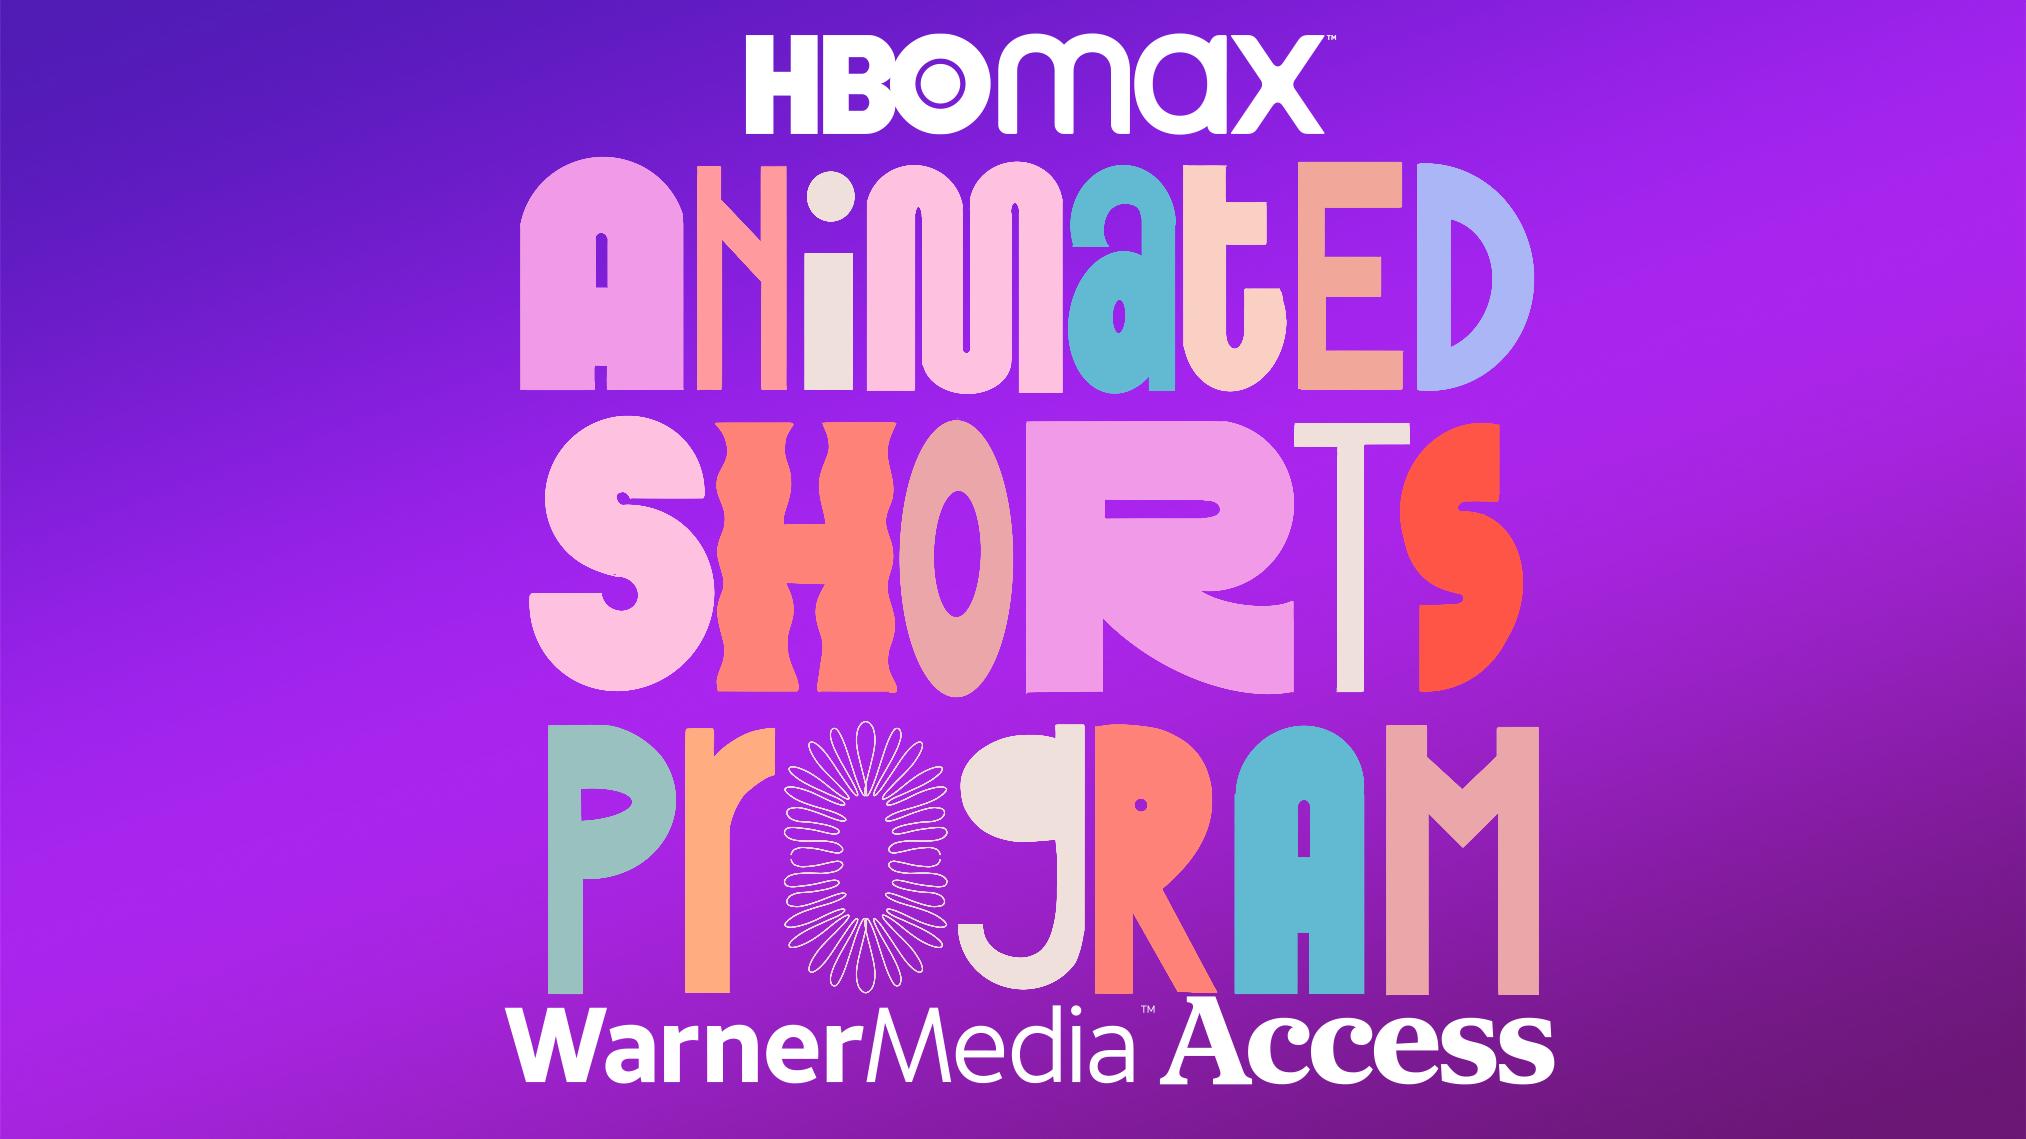 HBO Max x WarnerMedia Access Shorts Program